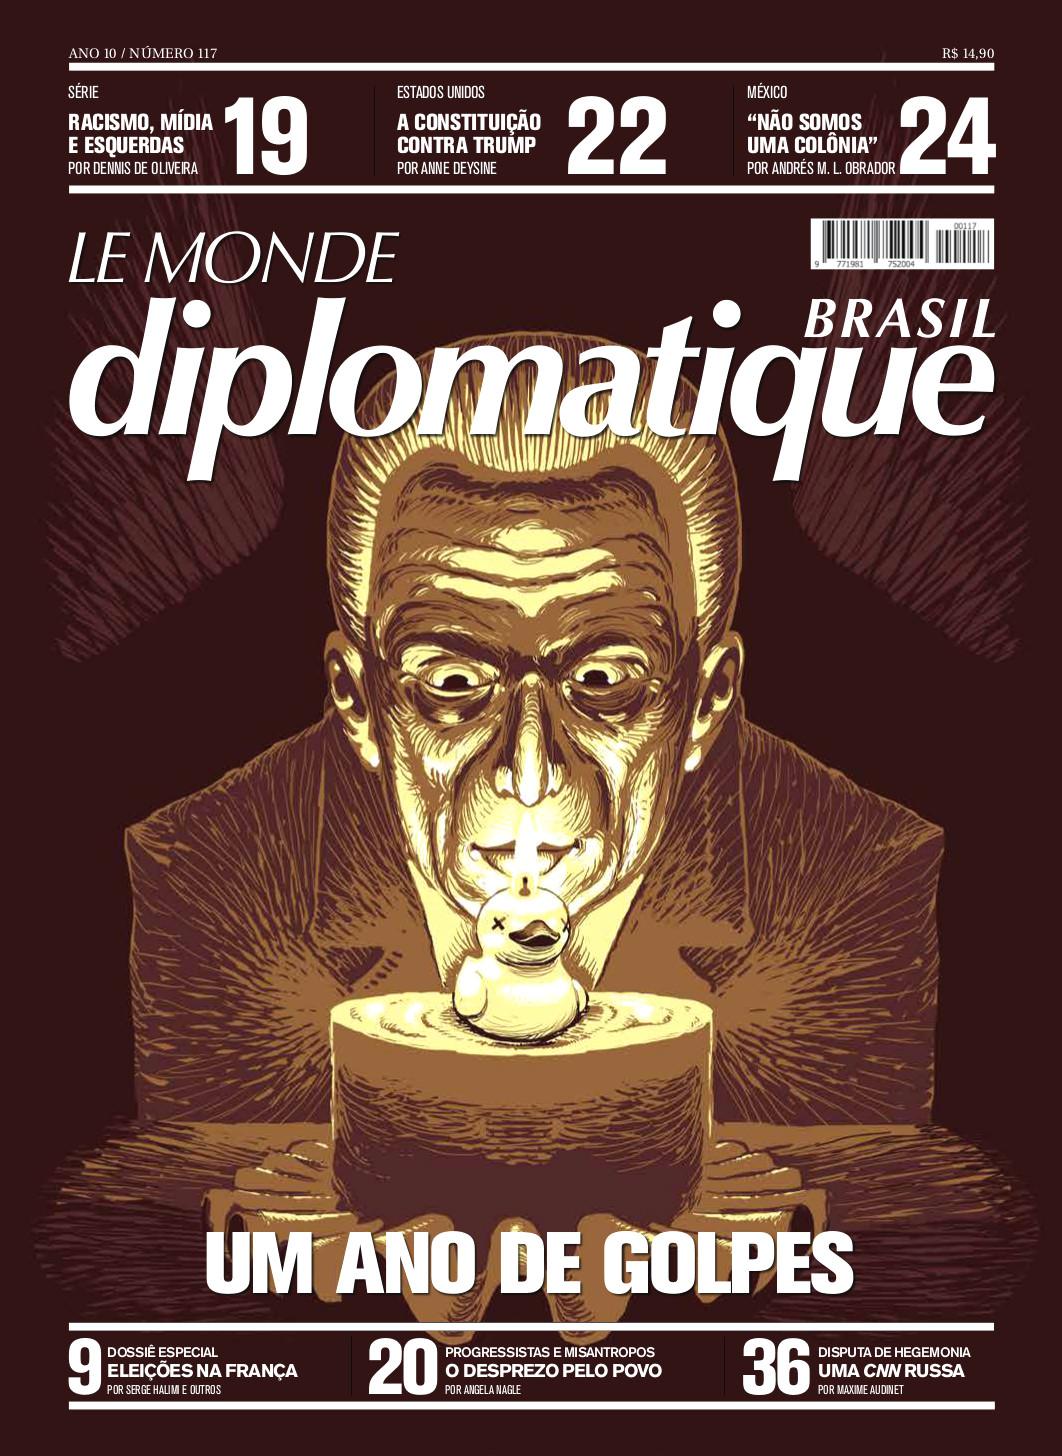 Le Monde Diplomatique Brasil análise é fundamental